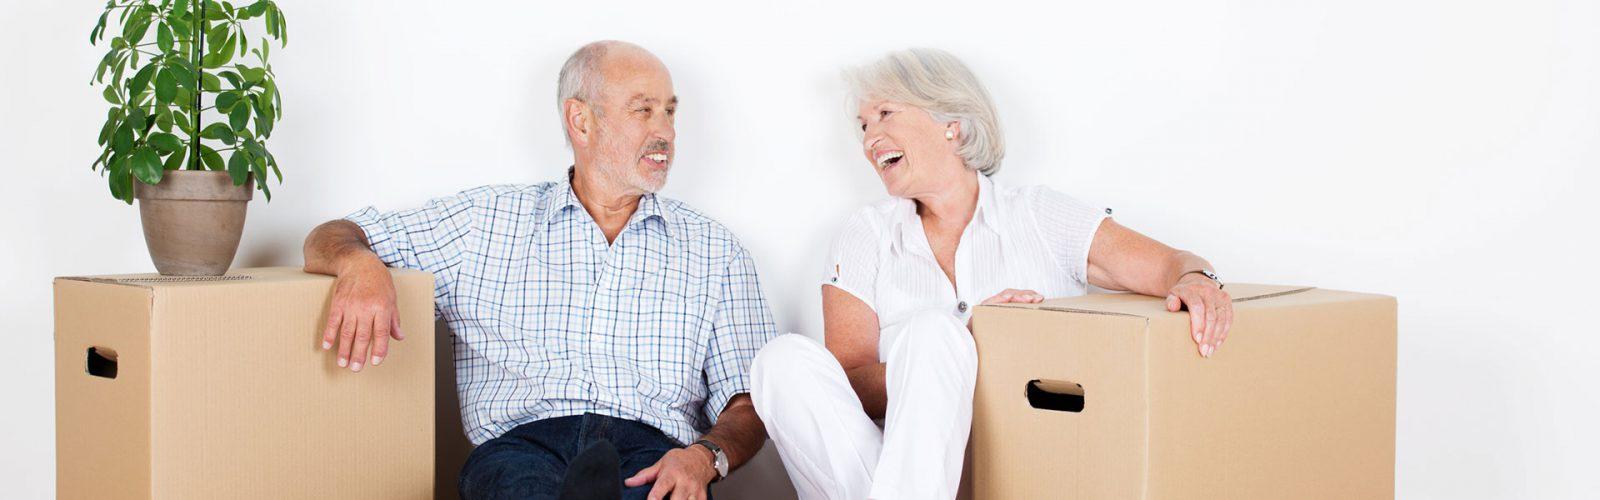 Seniorenpärchen Sitzt auf dem Boden neben zwei Umzugskartons